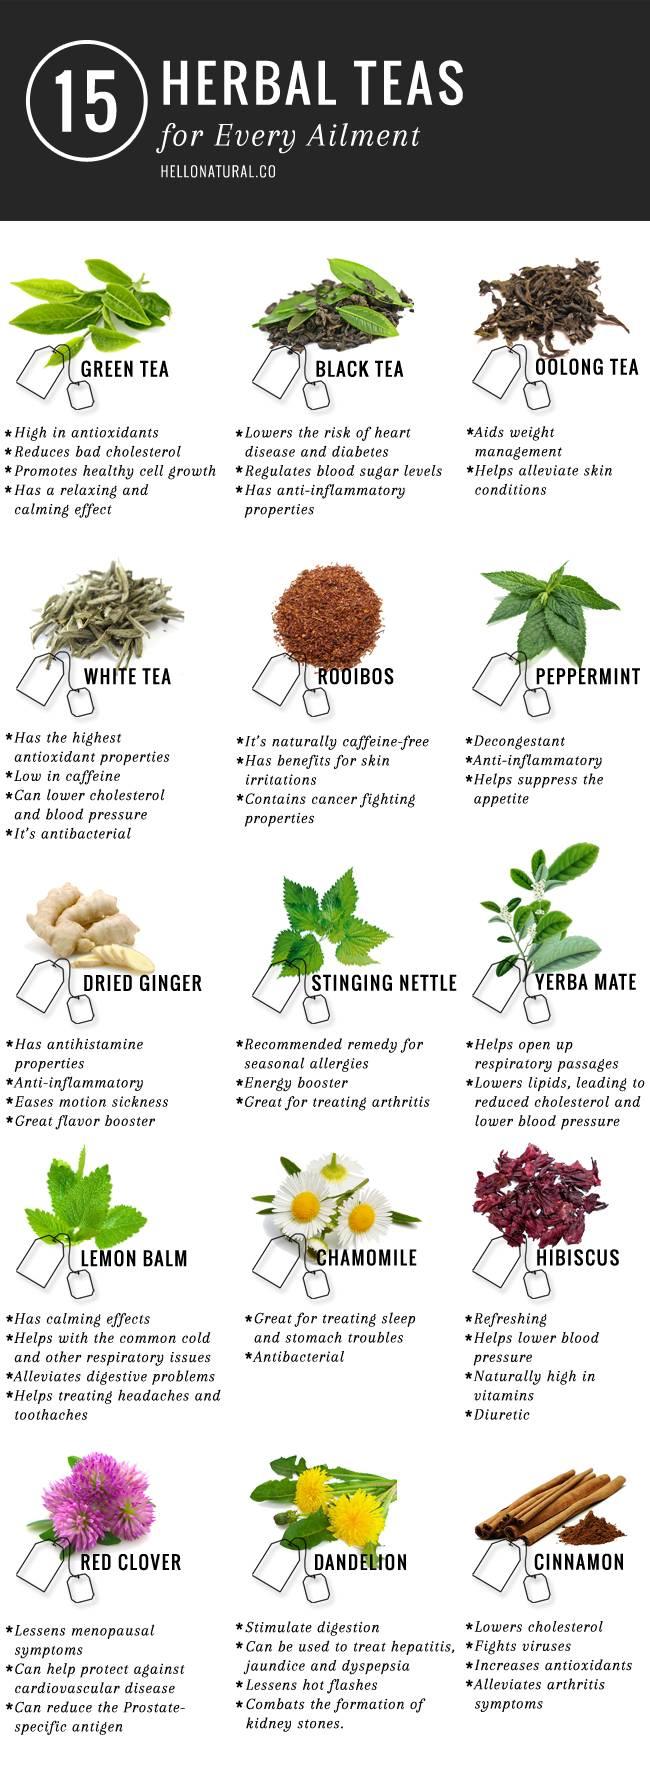 15-herbal-teas-for-every-ailment